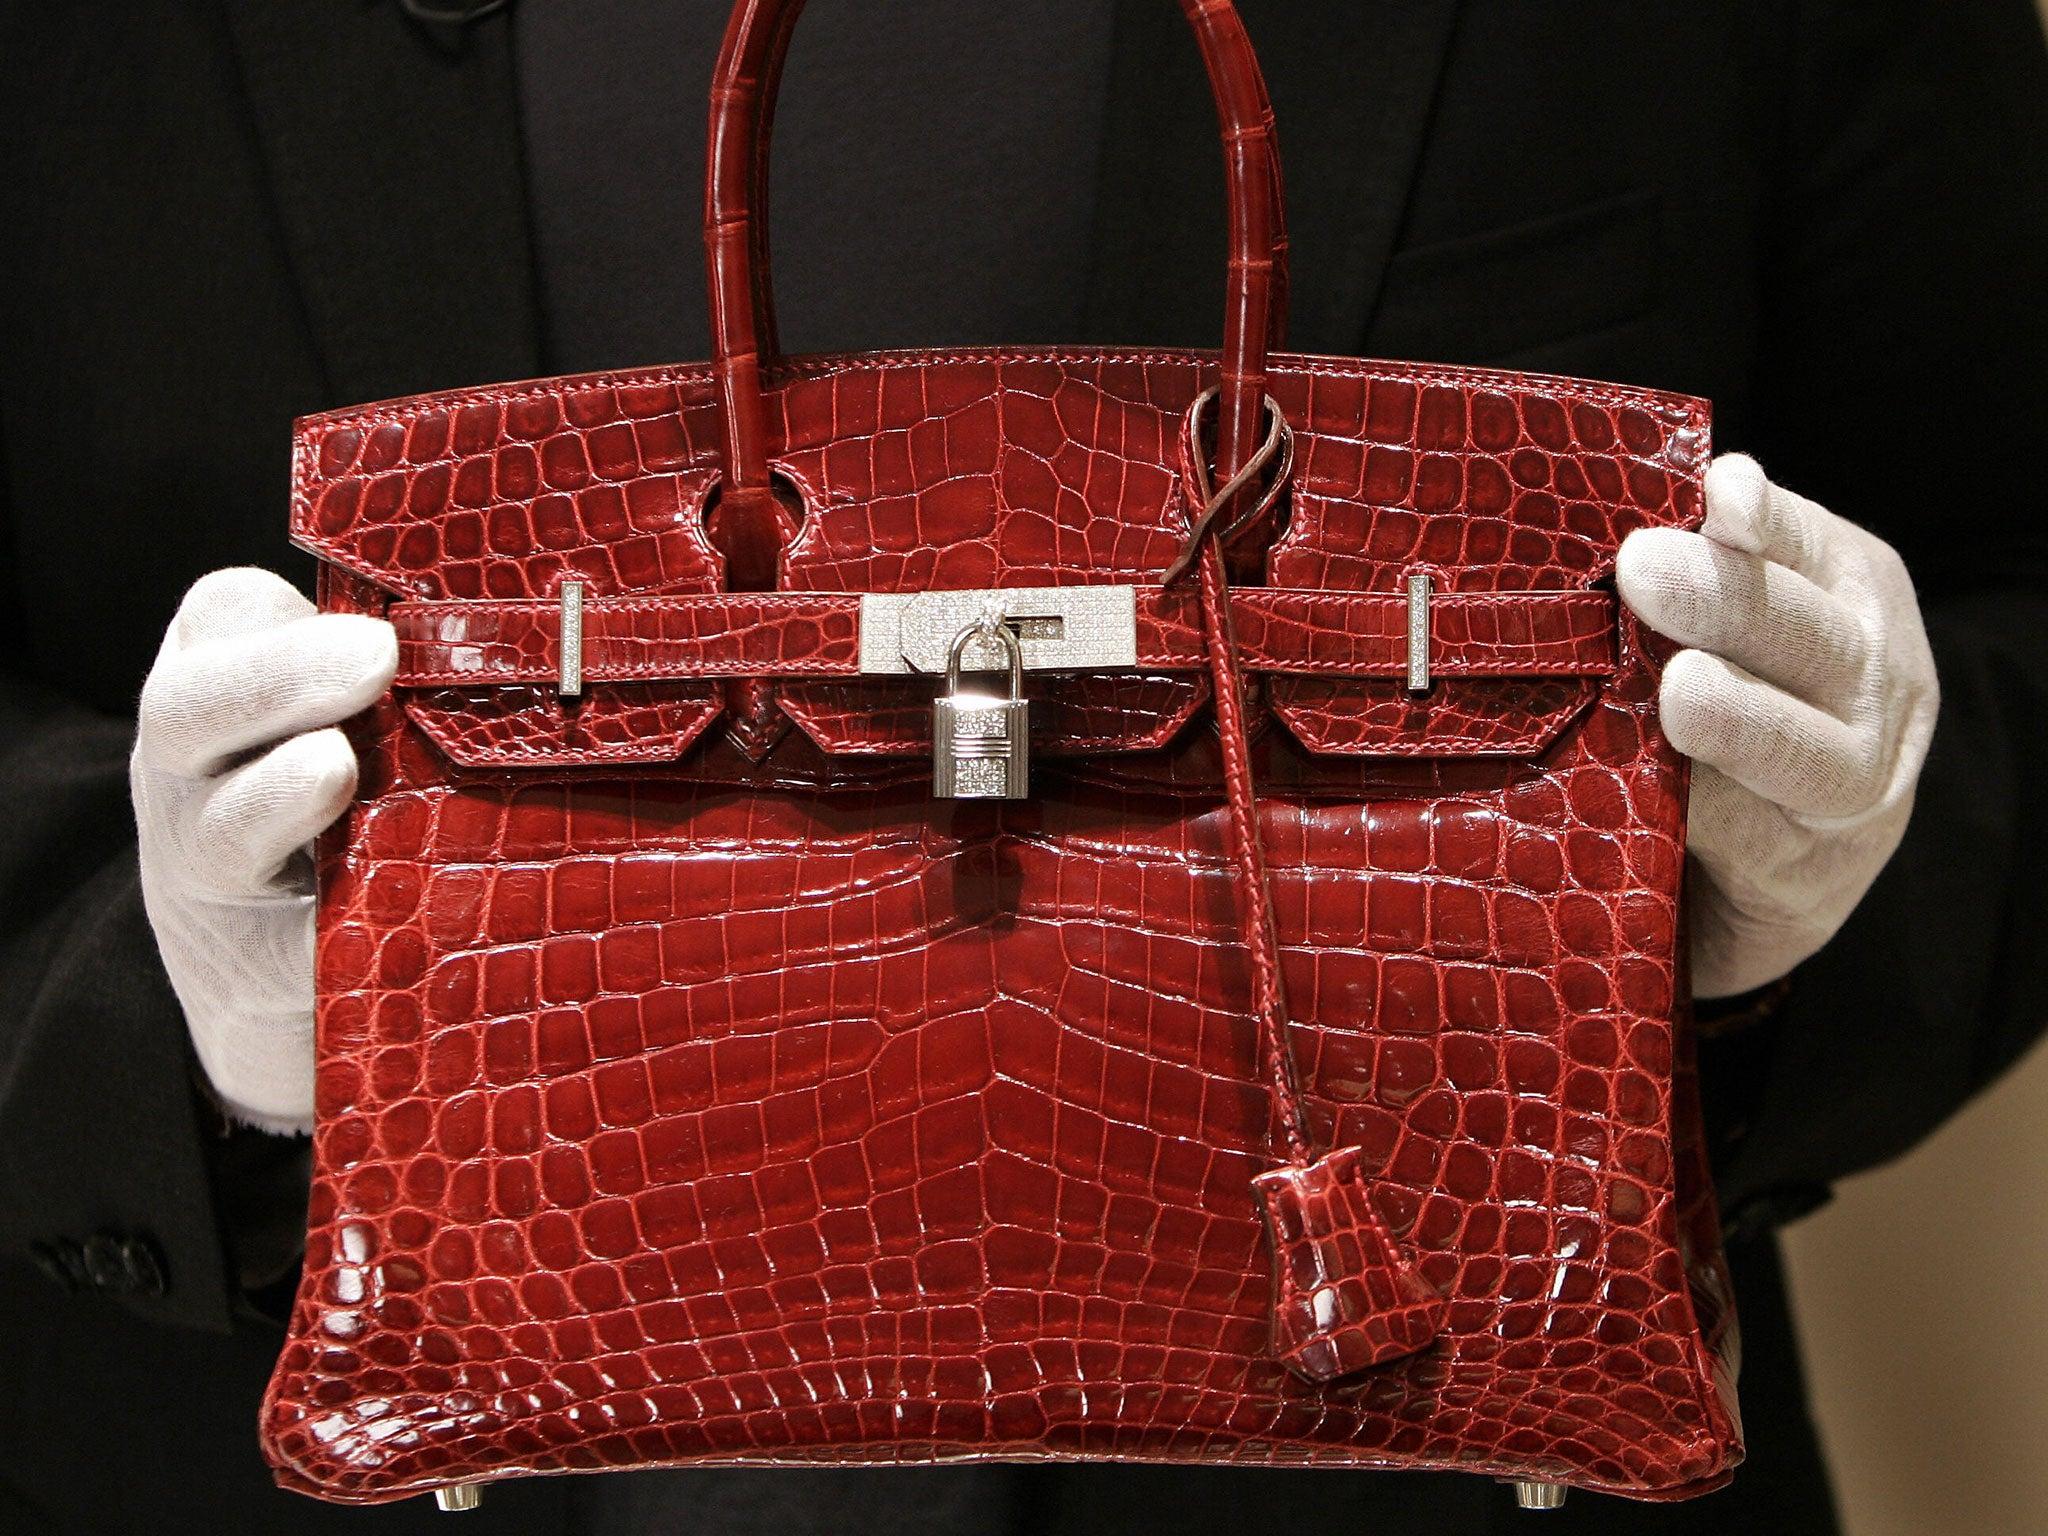 7cbe42142e8d A Hermes Birkin bag is a better investment than stocks or gold